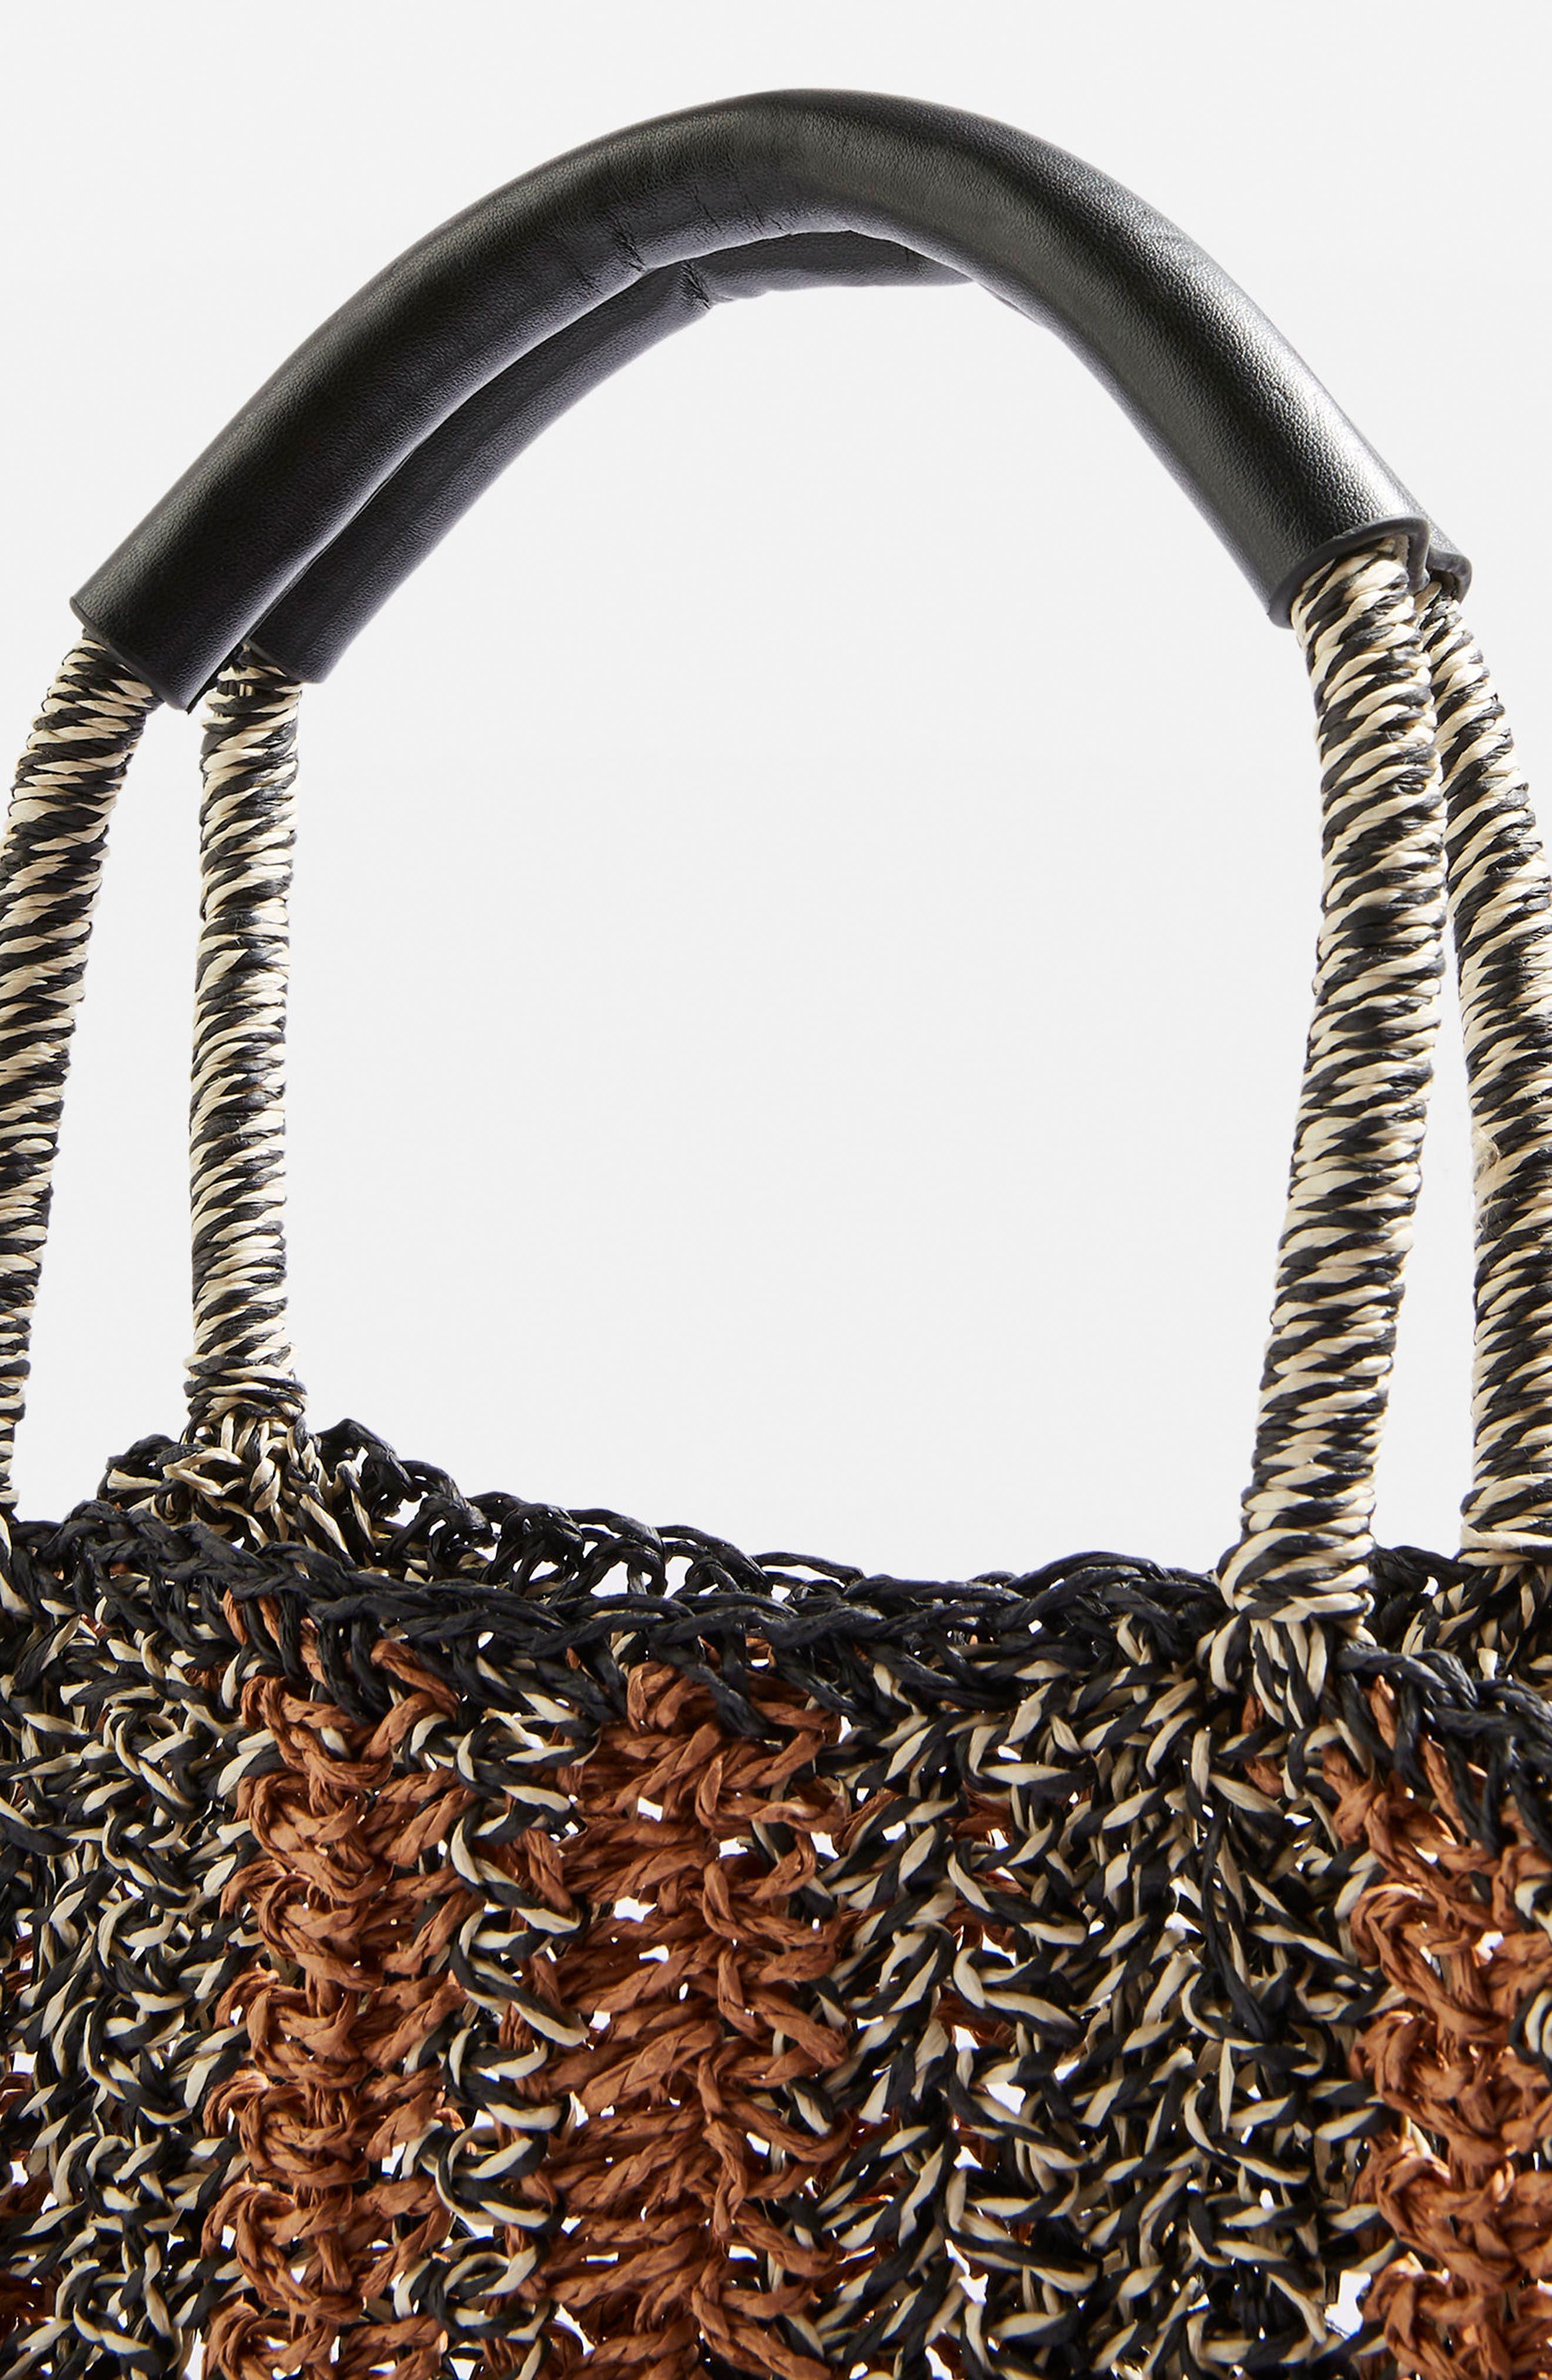 Bath Stripe Straw Tote Bag,                             Alternate thumbnail 4, color,                             Black Multi